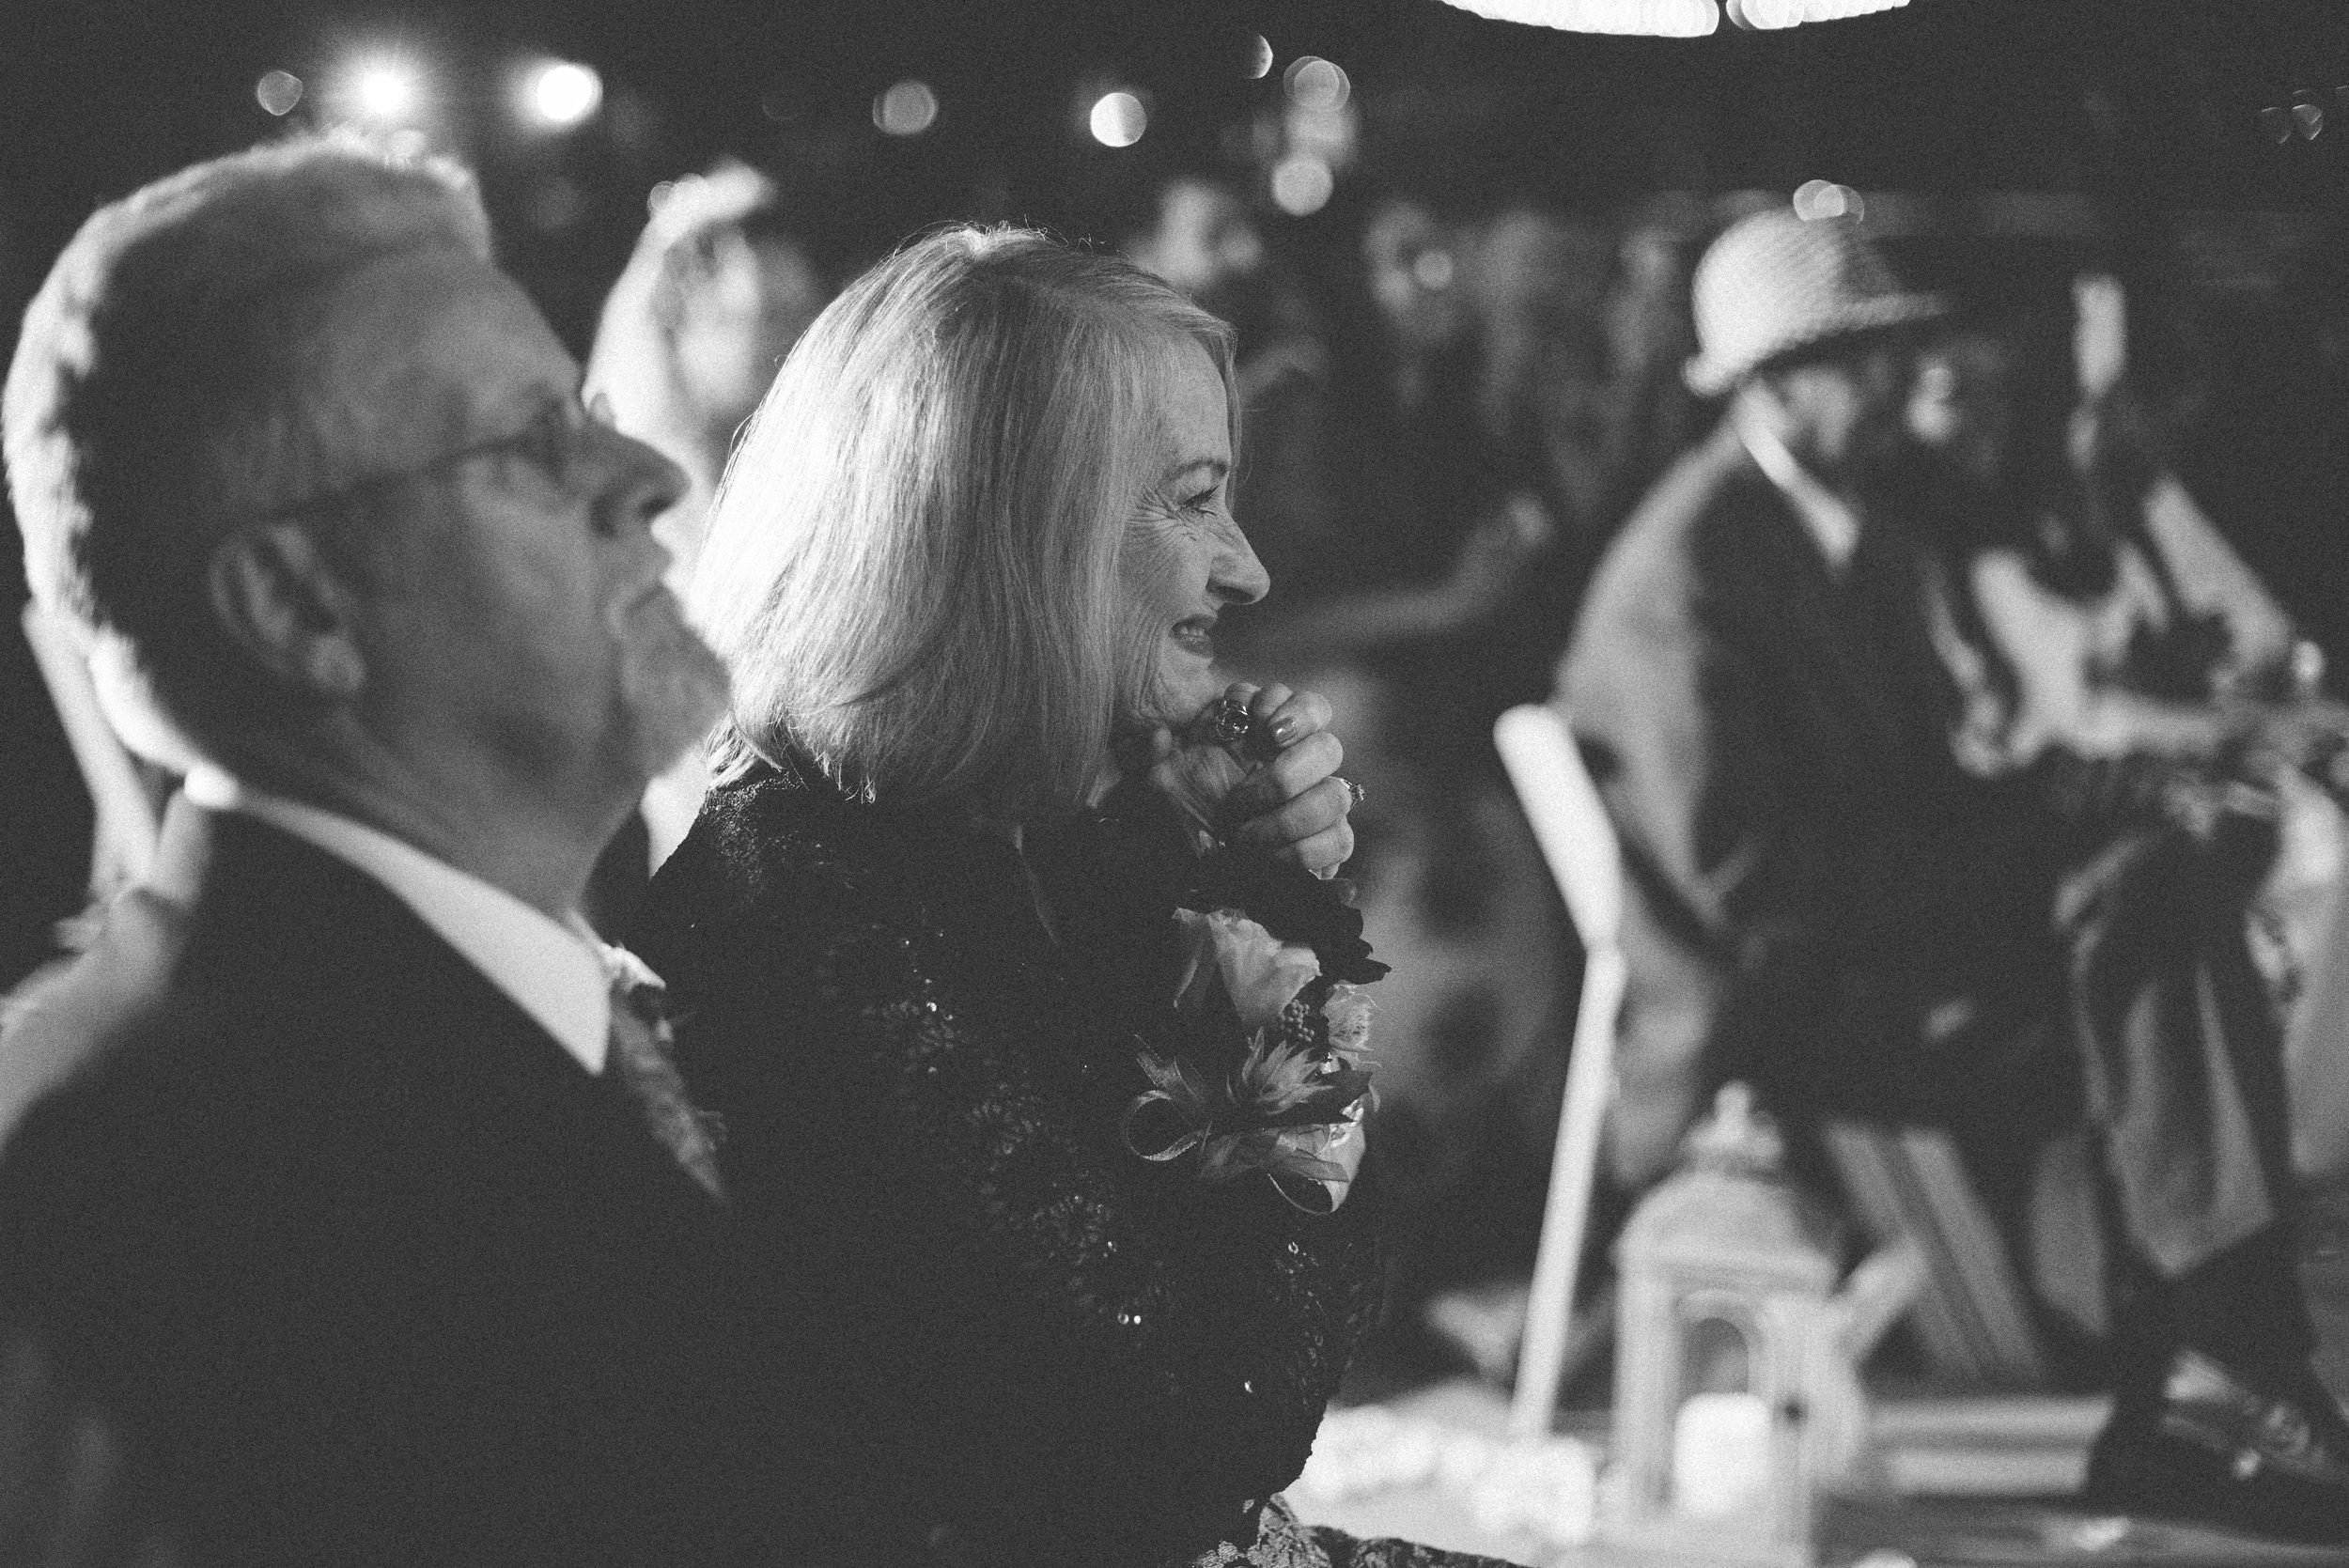 Southern-California-Wedding-Photography-Ksquared-Photography-838.jpg